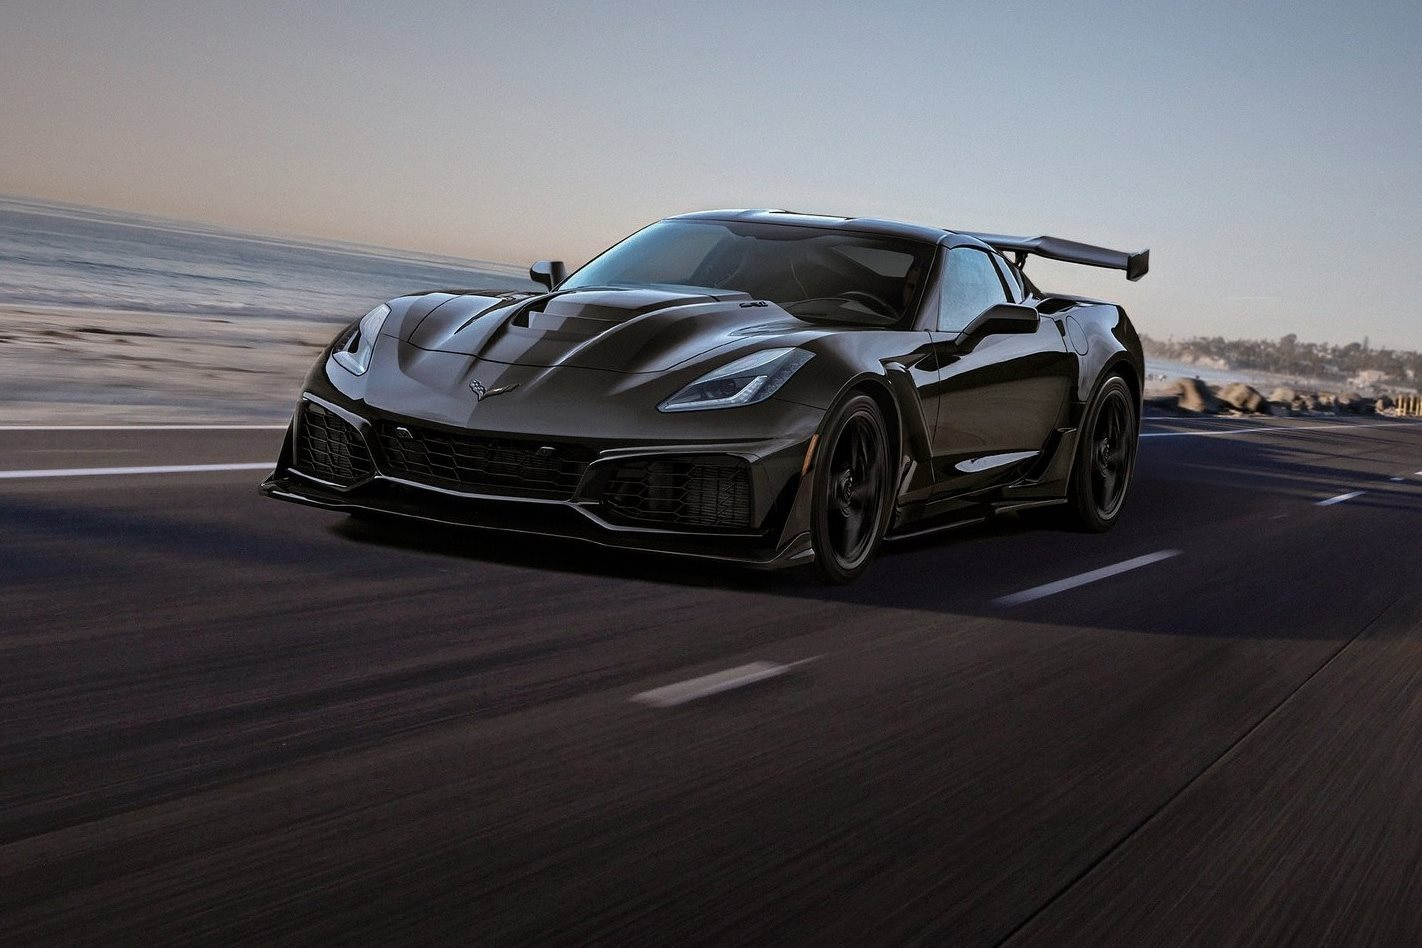 2018 Chevrolet Corvette Zr1 Will Crack 100km H In Less Than Three Seconds